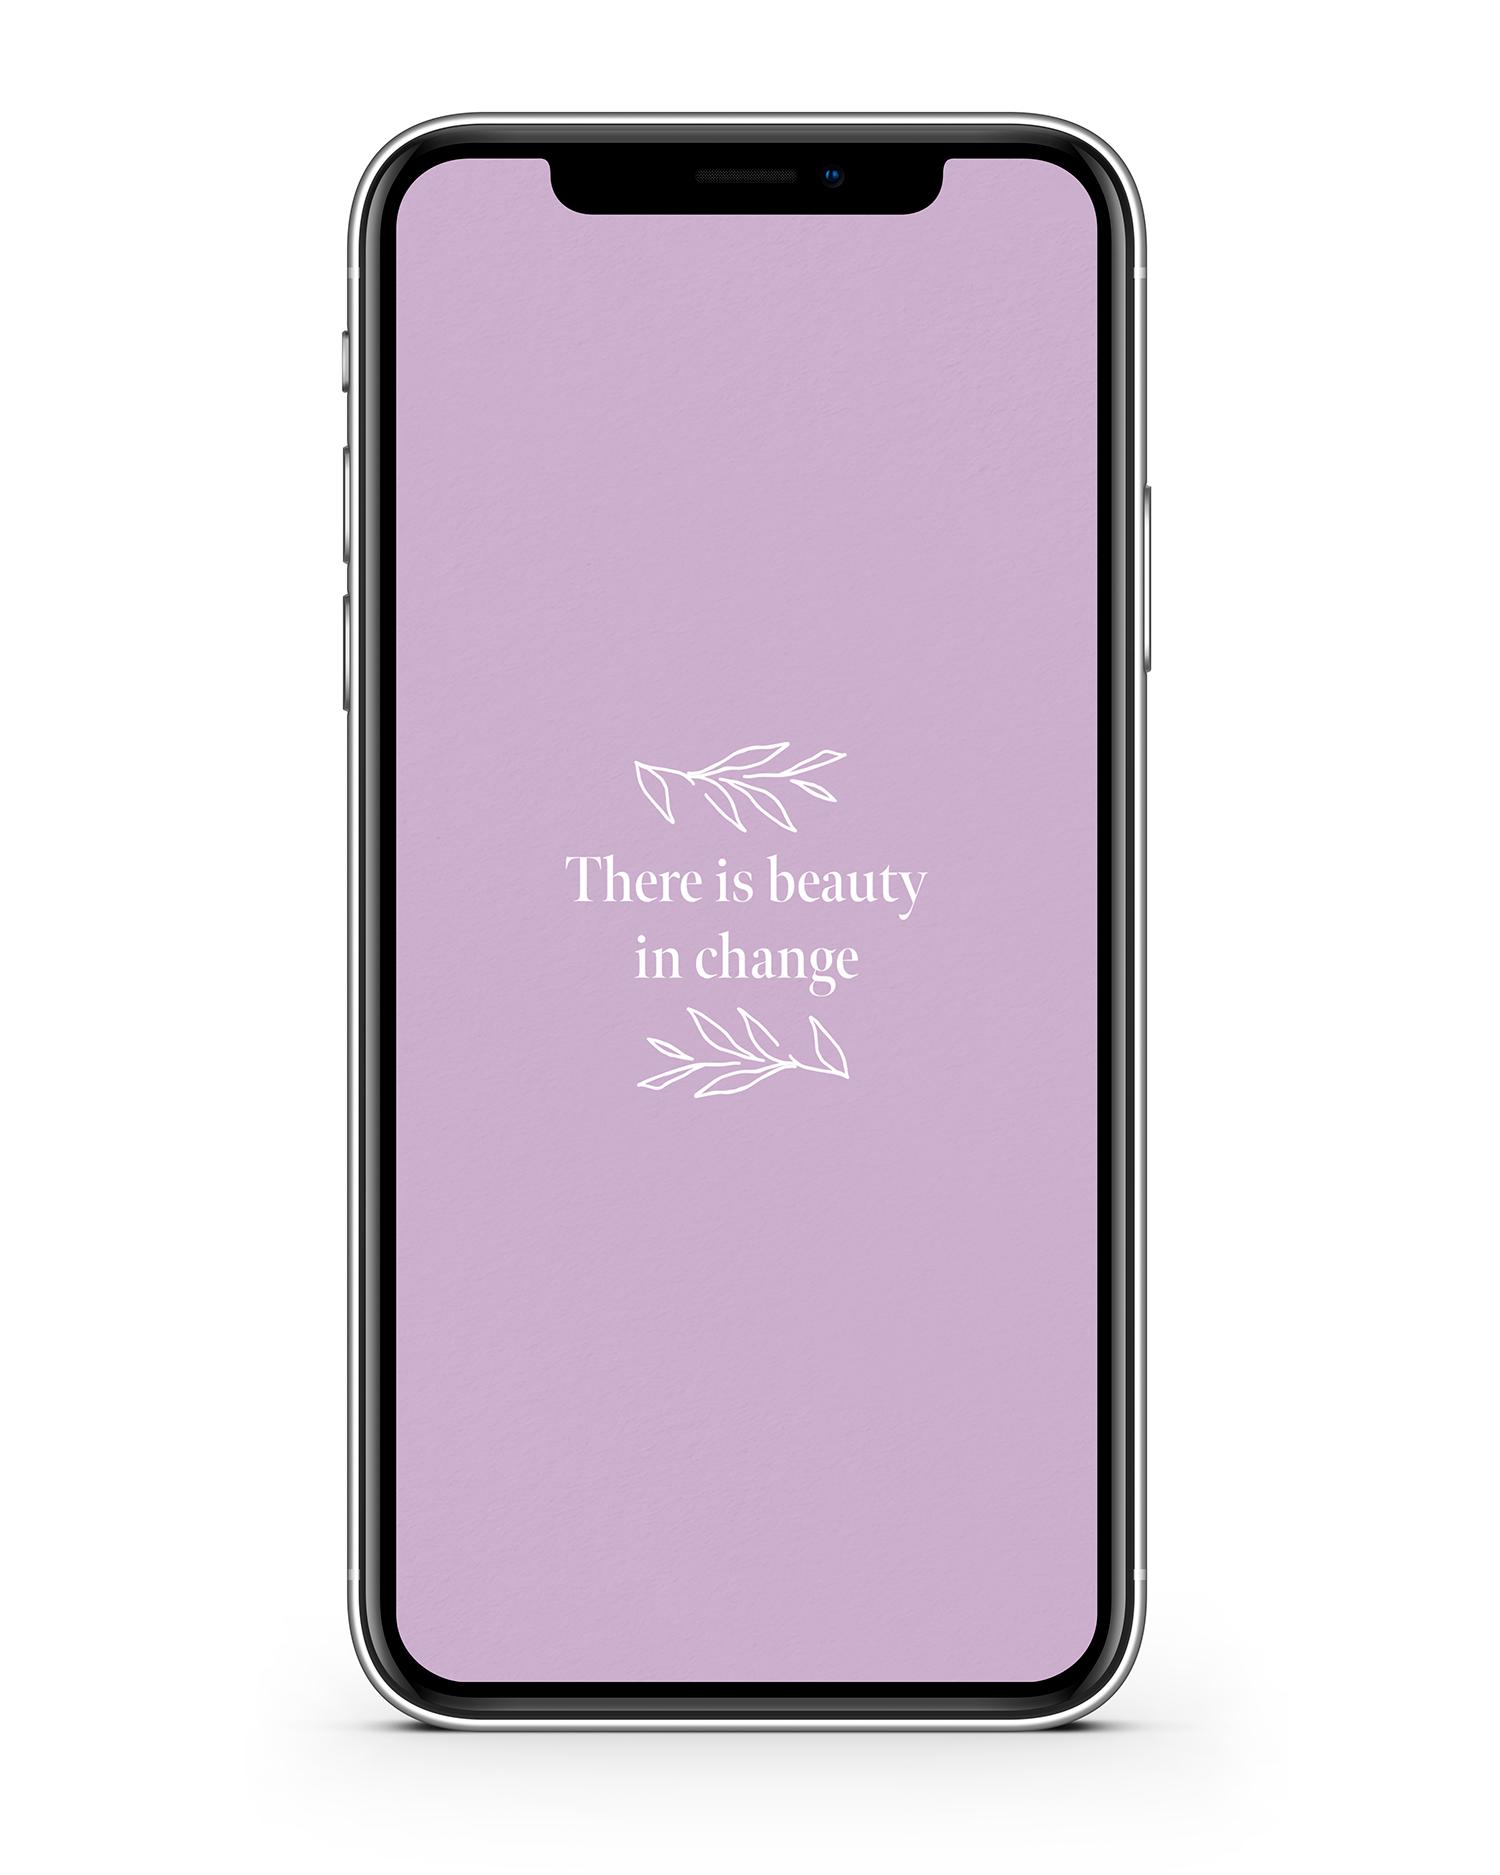 Haley Grand iPhone Wallpaper Beauty in Change